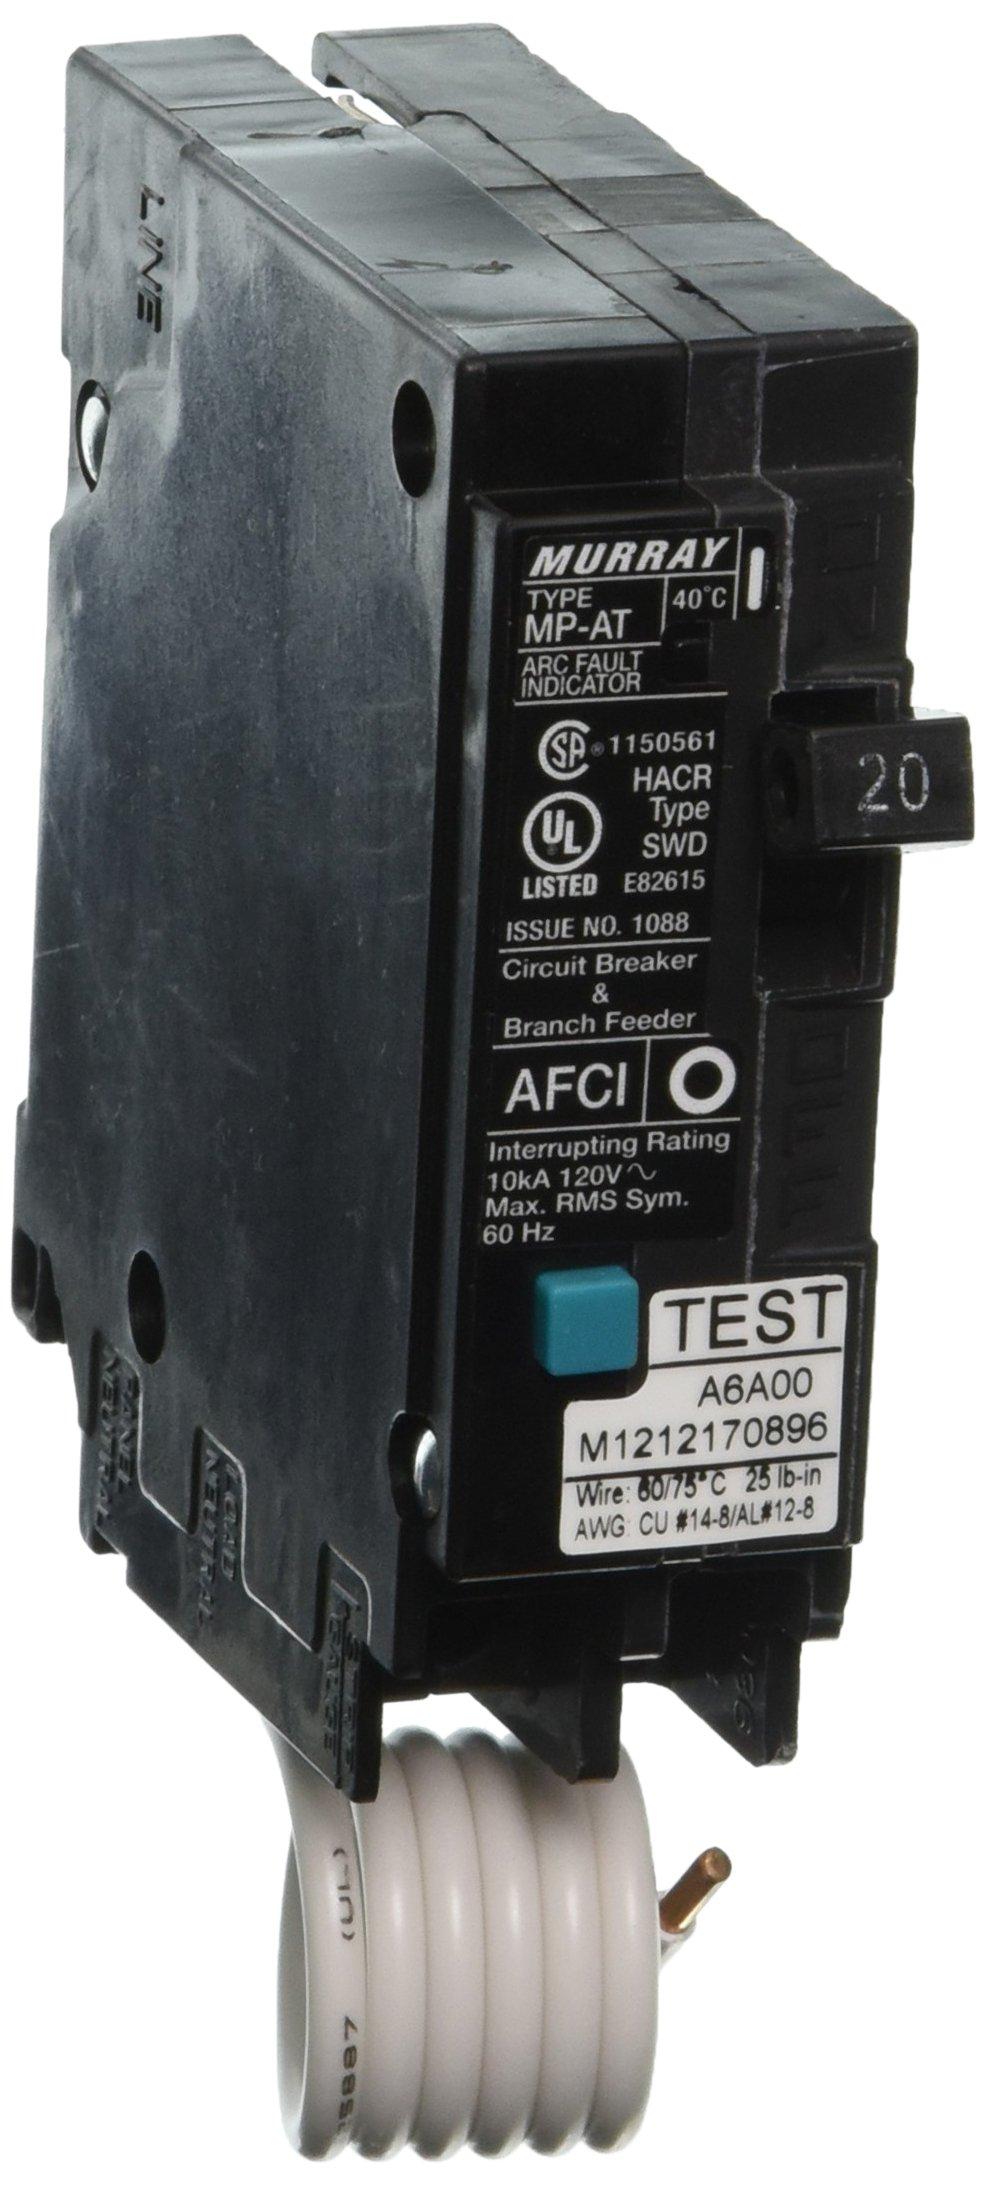 Murray MP120AFP 120-volt Single Pole Arc Fault Circuit Breaker, Clam Shell